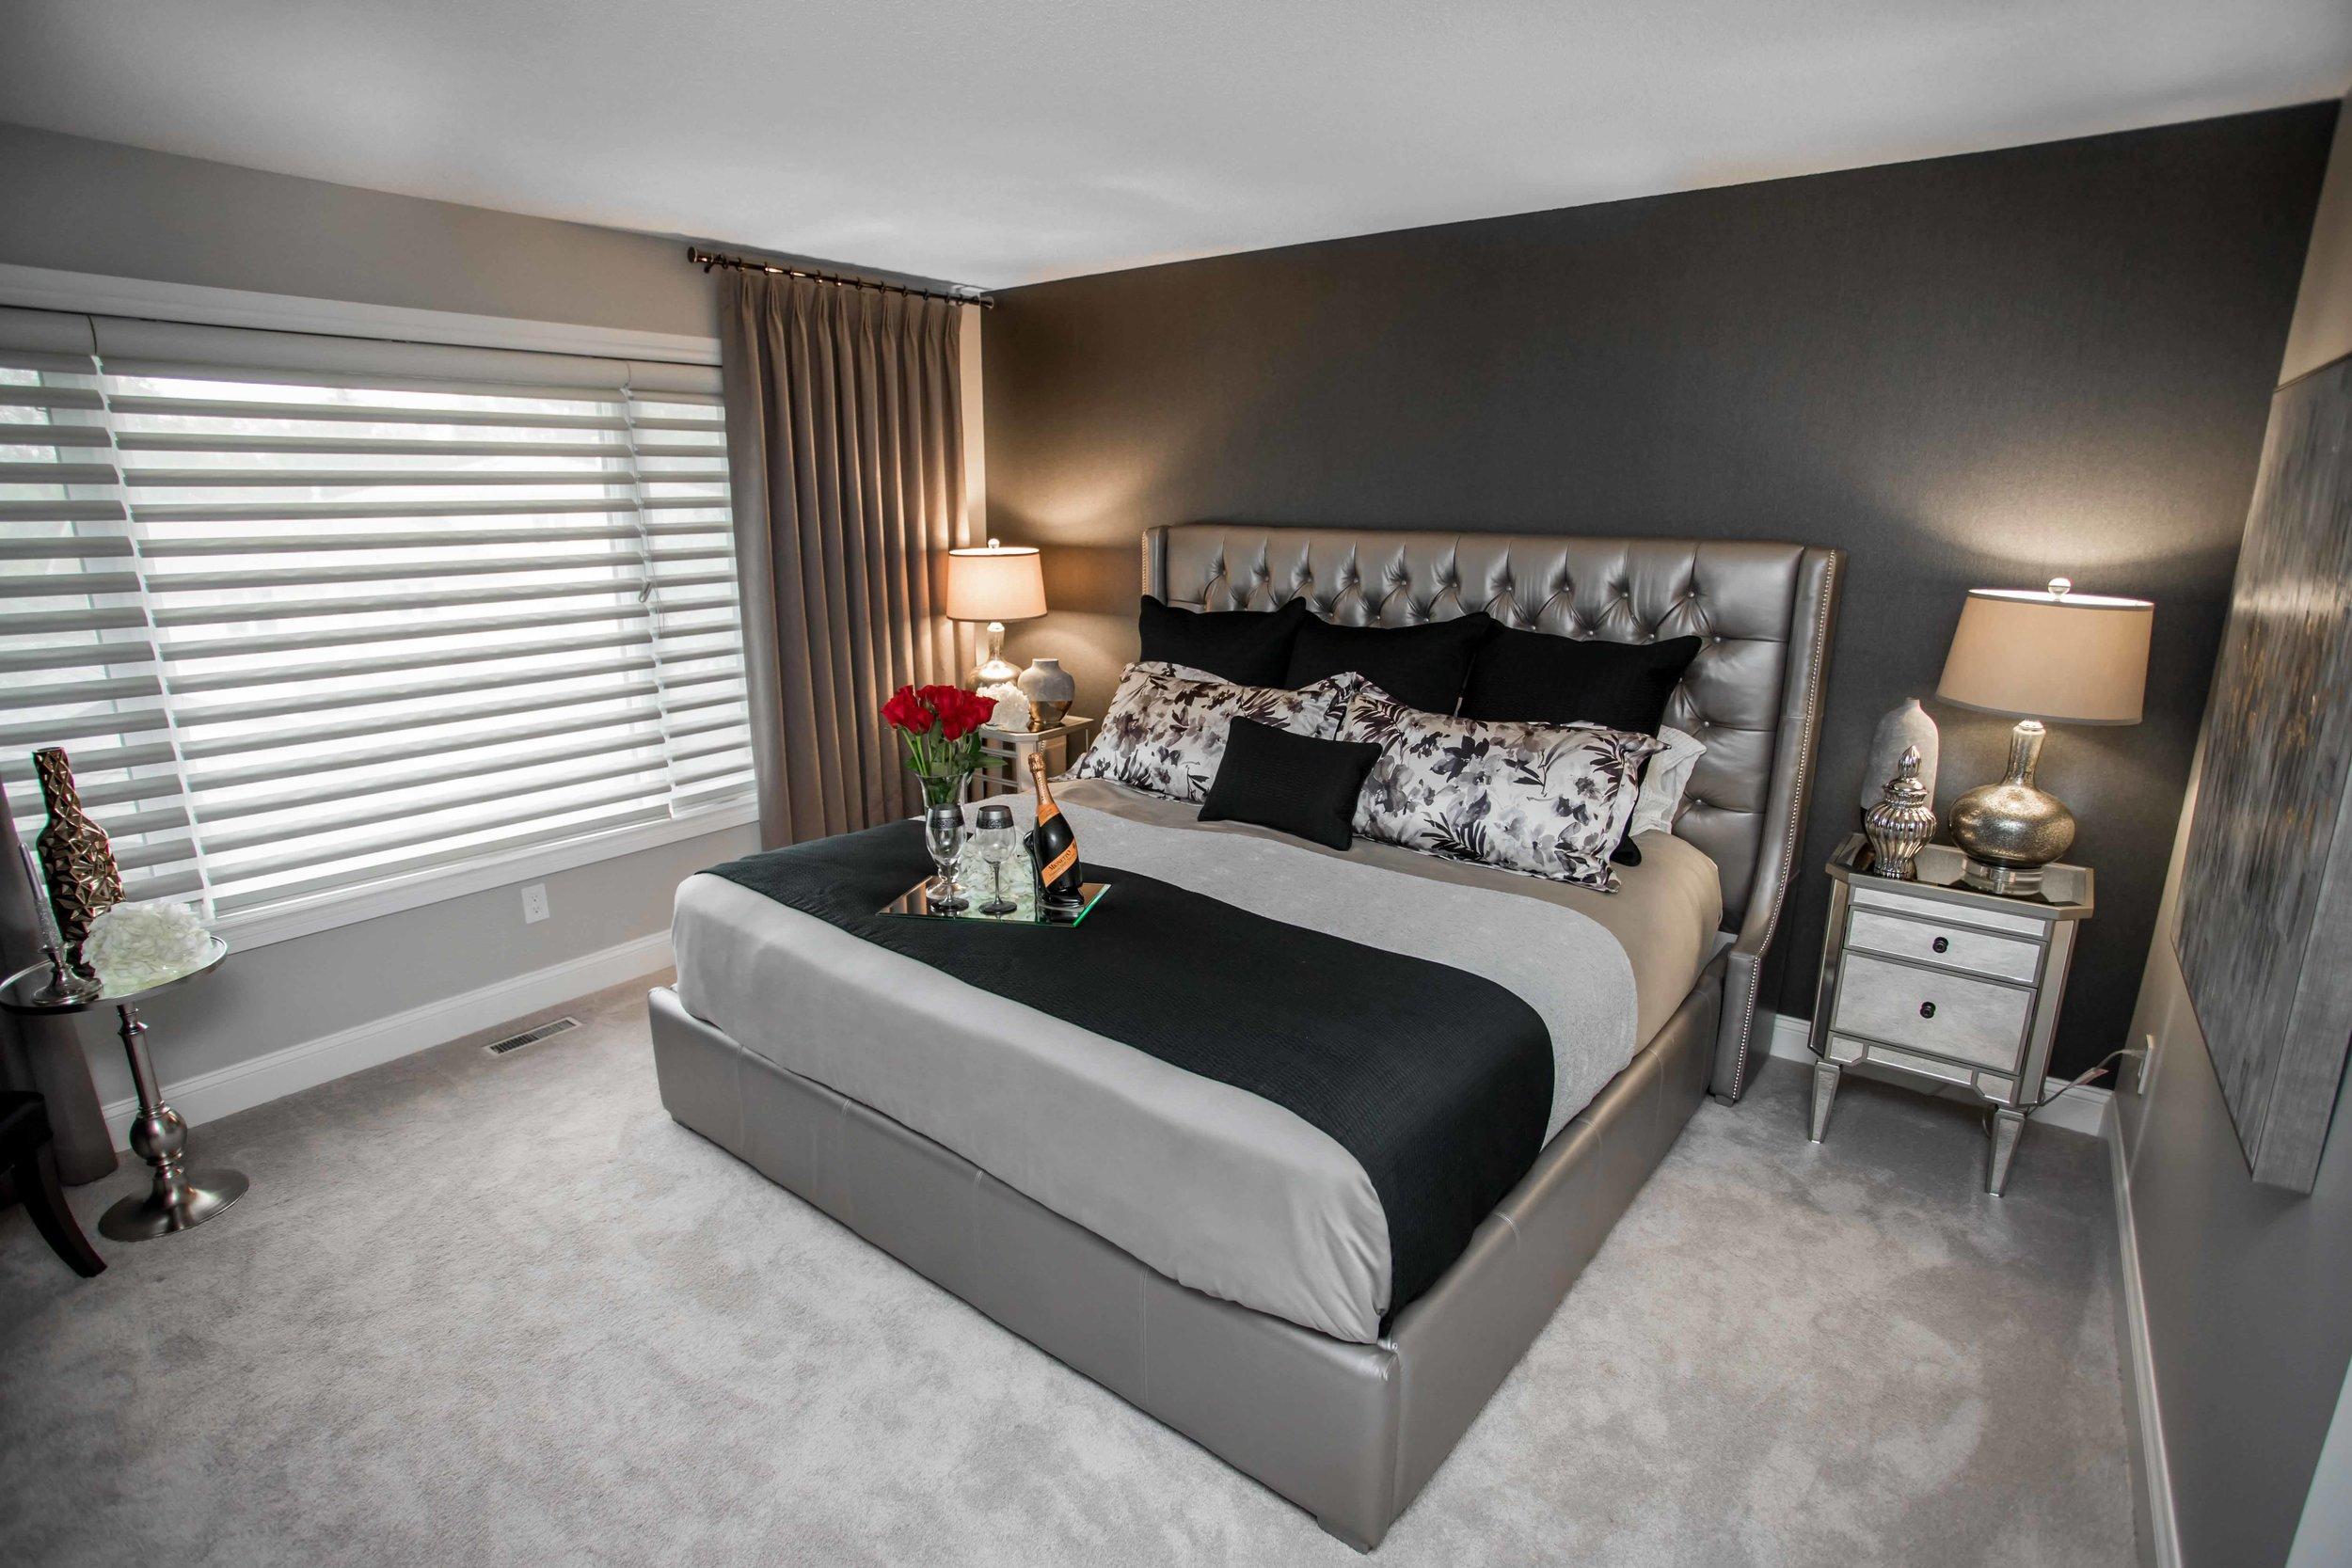 Picturesk-RL-Appelquist Bedrooms-16.jpg